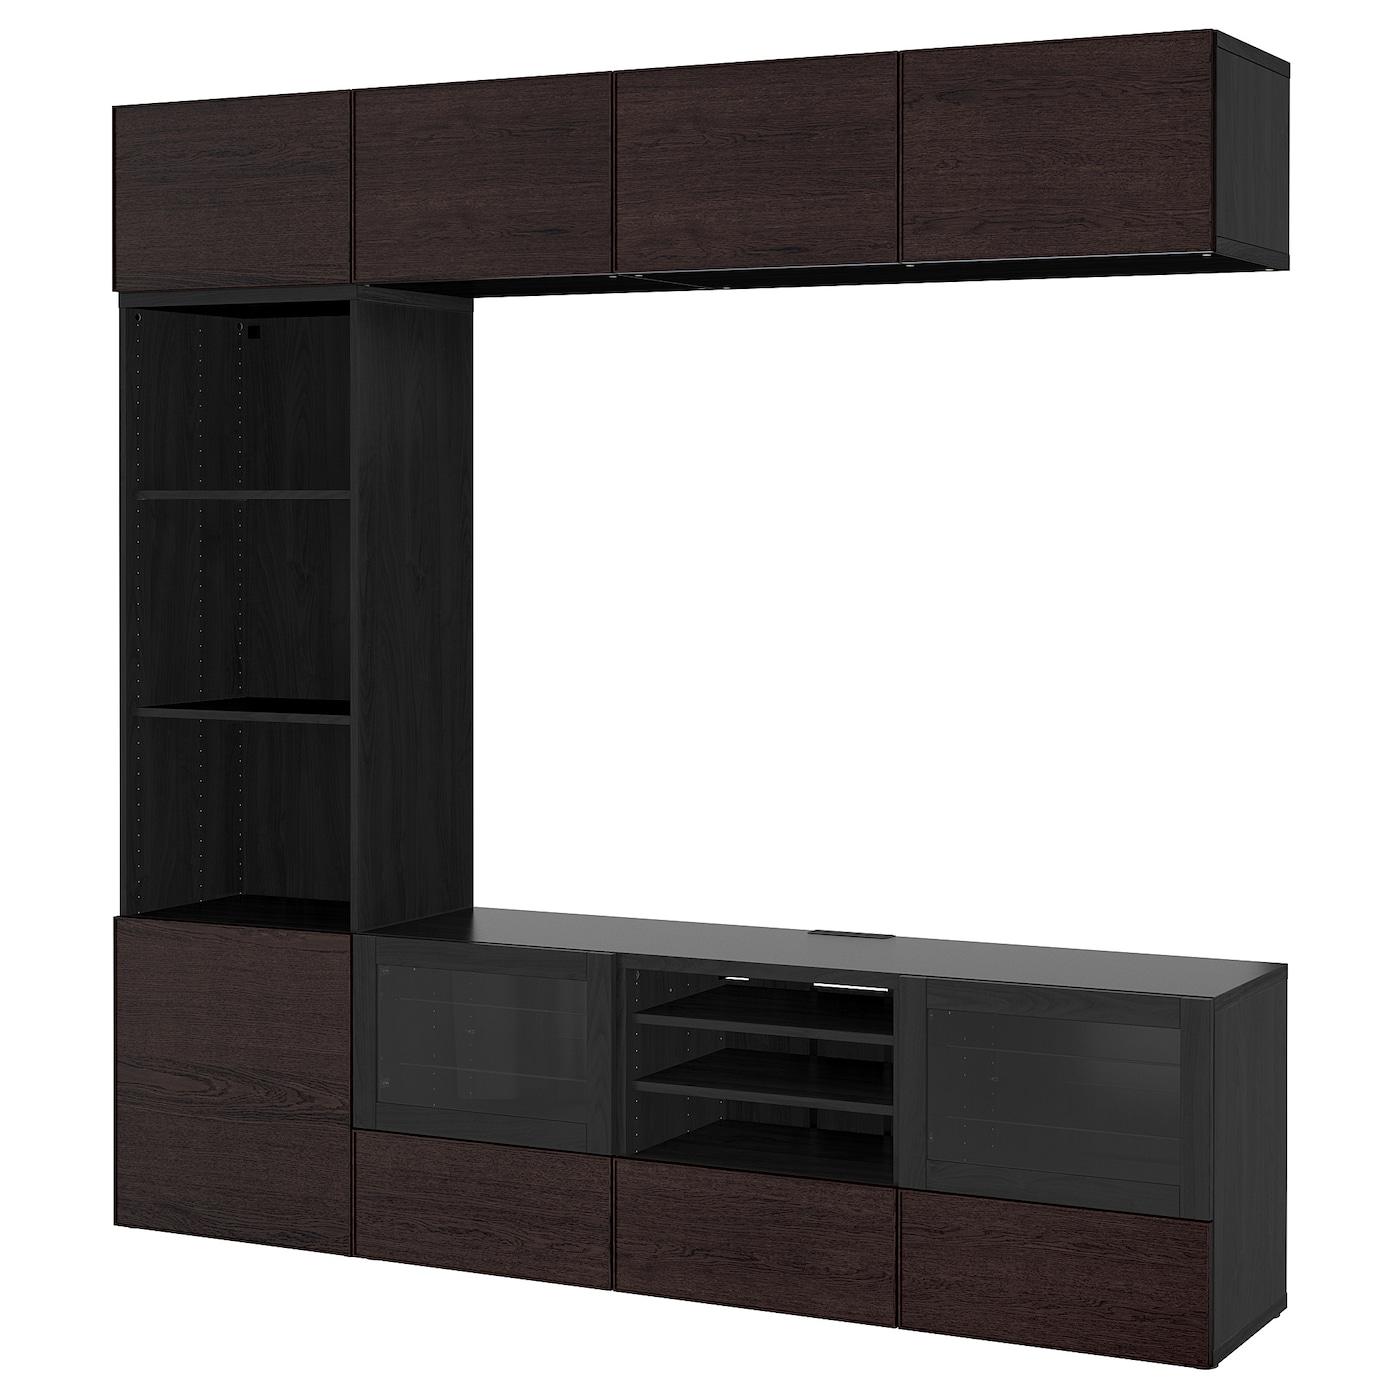 Best mueble tv con almacenaje negro marr n inviken vidrio transparente negro marr n 240 x 40 x - Muebles almacenaje ikea ...